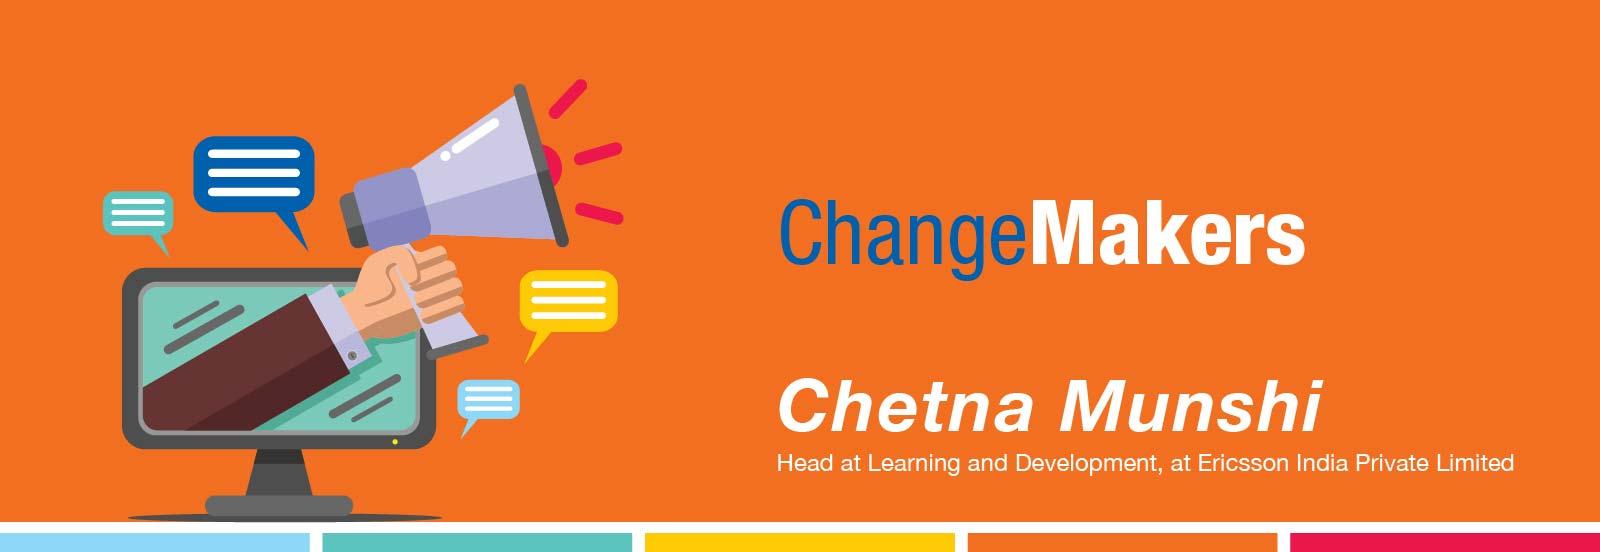 Chetna Munshi